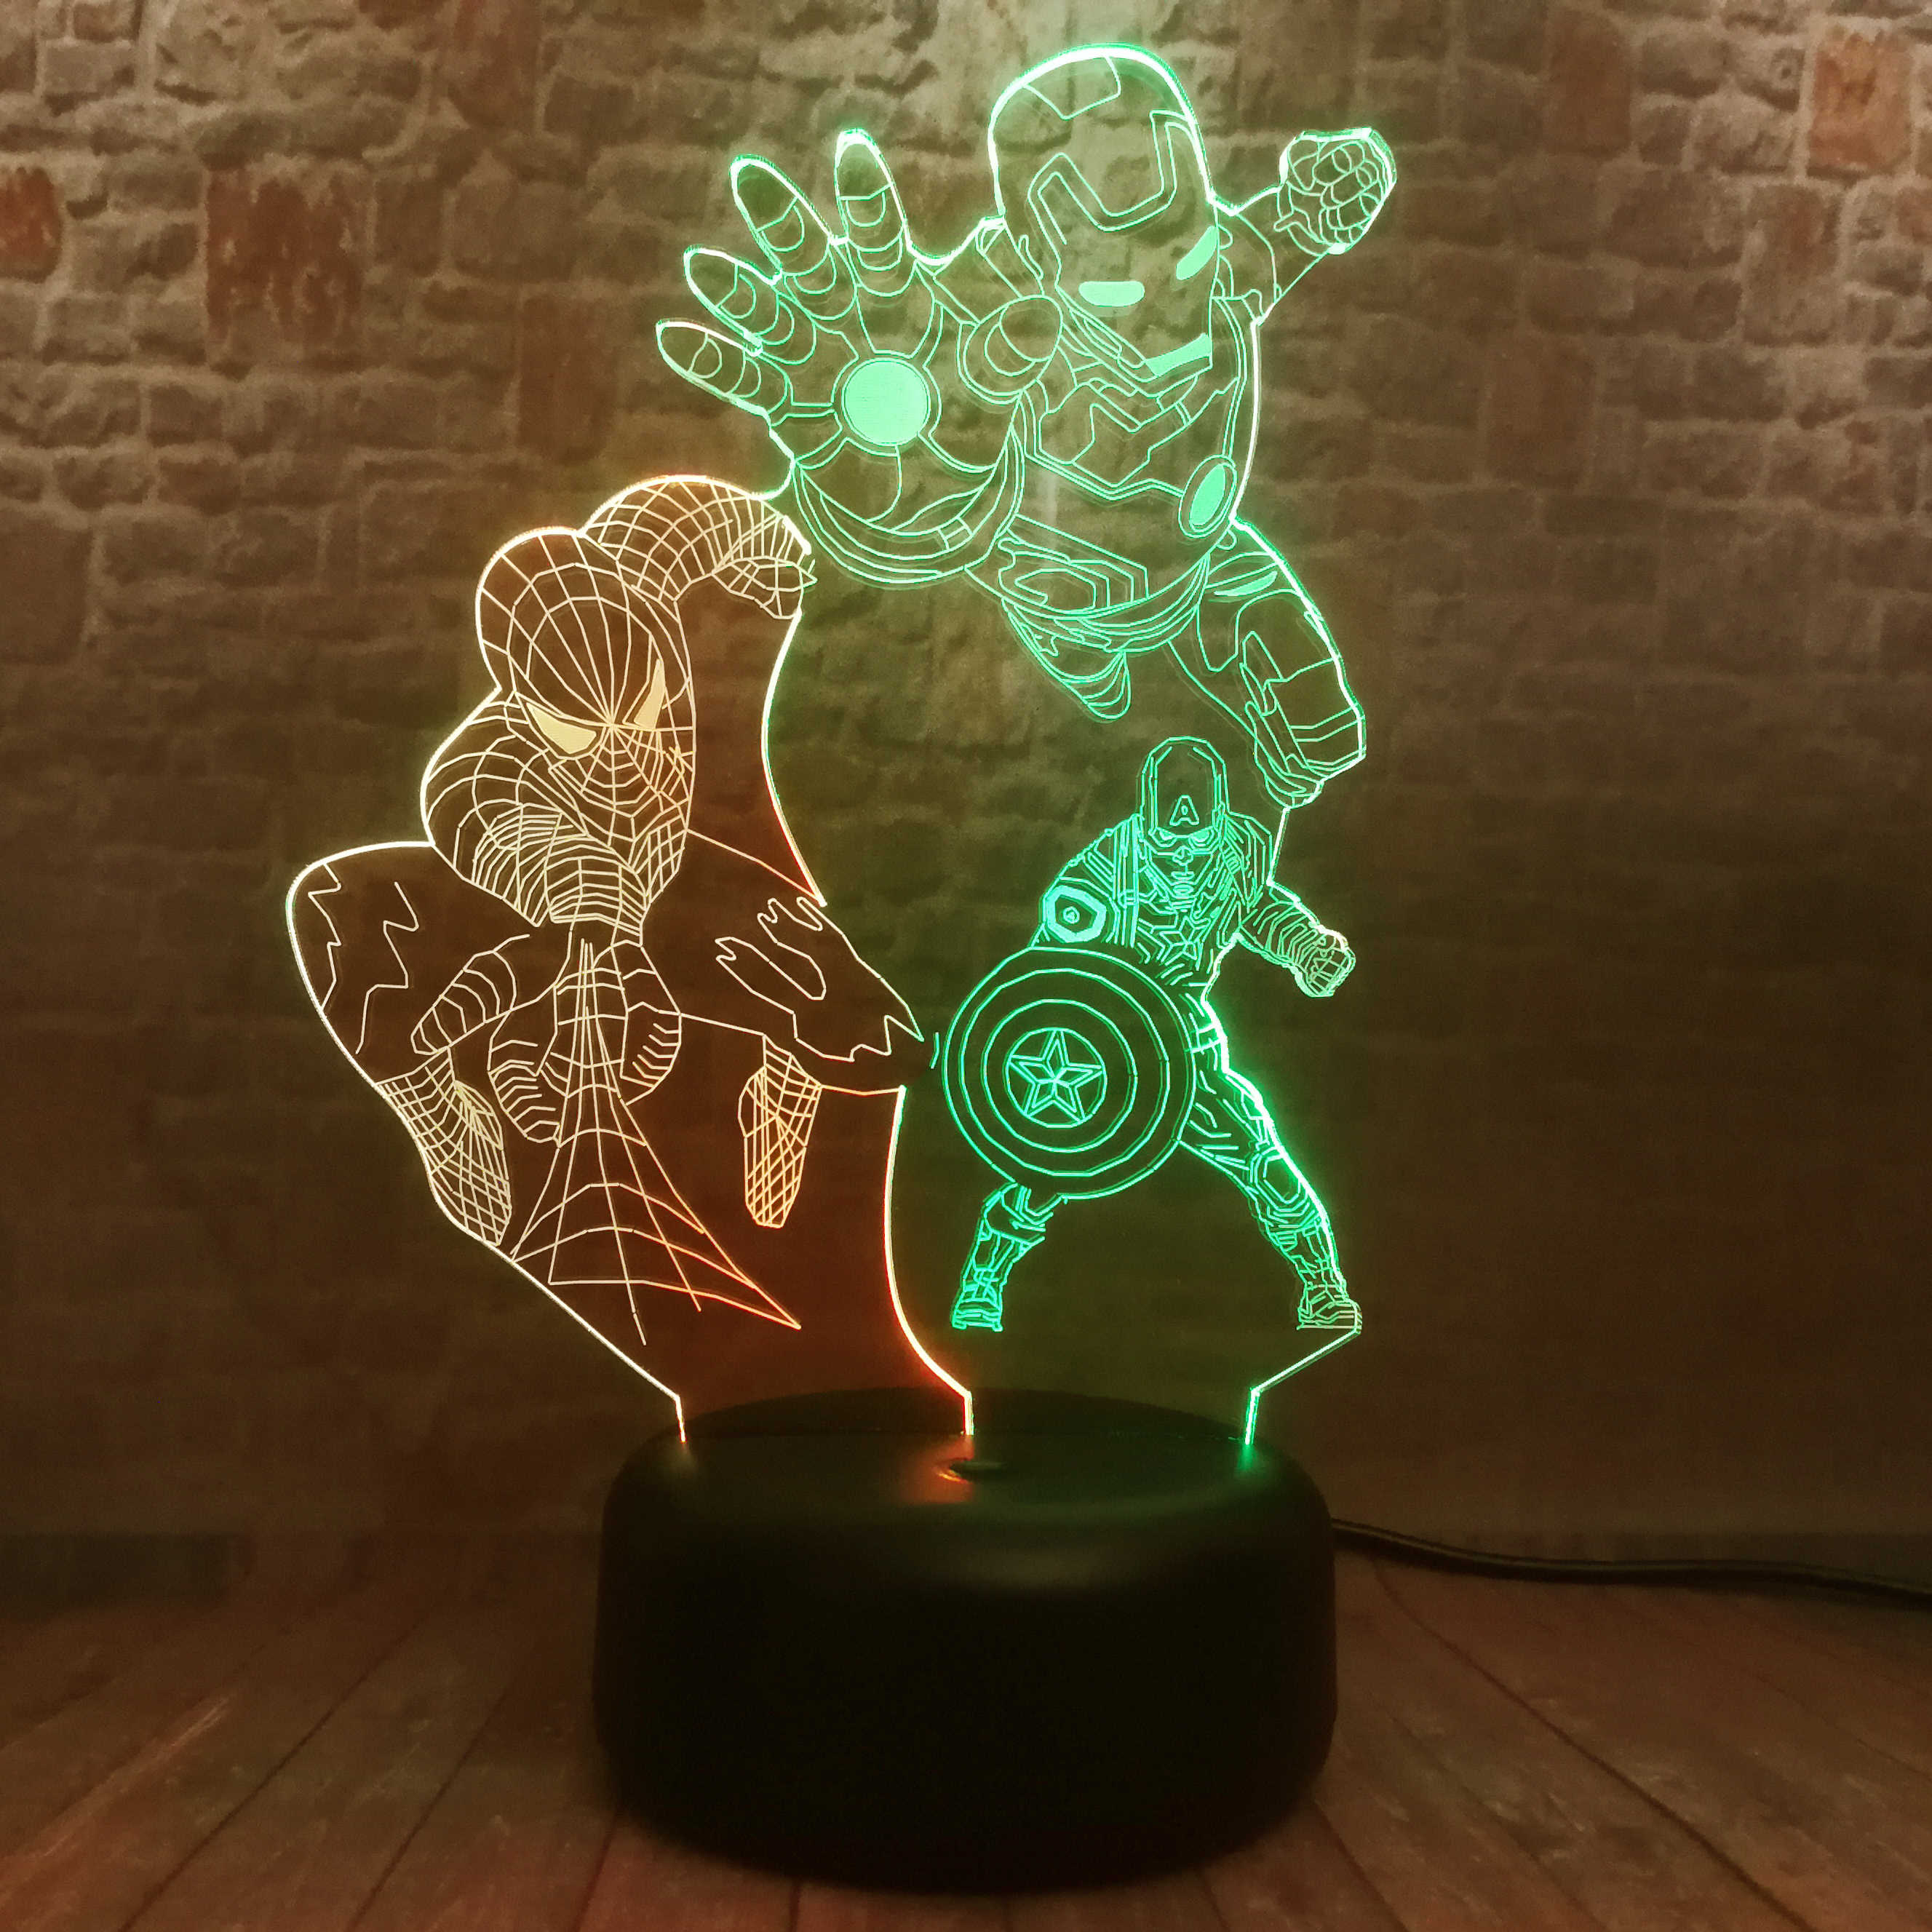 Amroe 3 héroe vengadores final Ironman Marvel Spiderman, Capitán América, figura 3D luz nocturna LED 7 mixto cambio de colores de juguete Luz